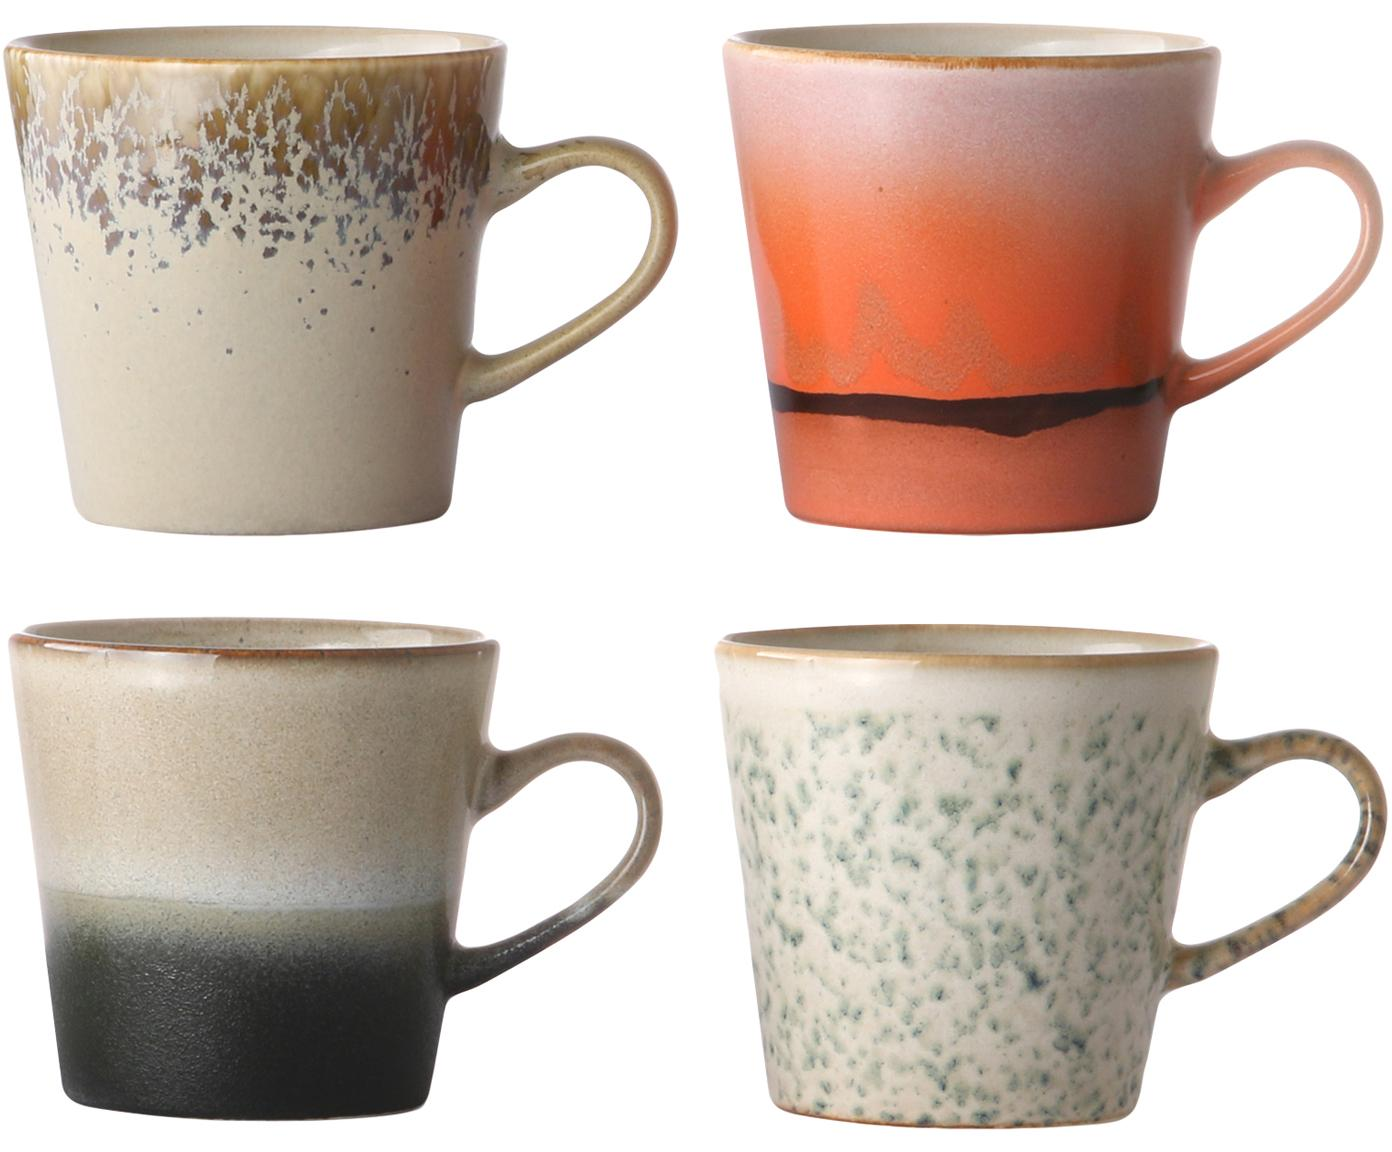 Set 4 tazze fatte a mano 70's, Ceramica, Multicolore, Ø 9 x Alt. 8 cm